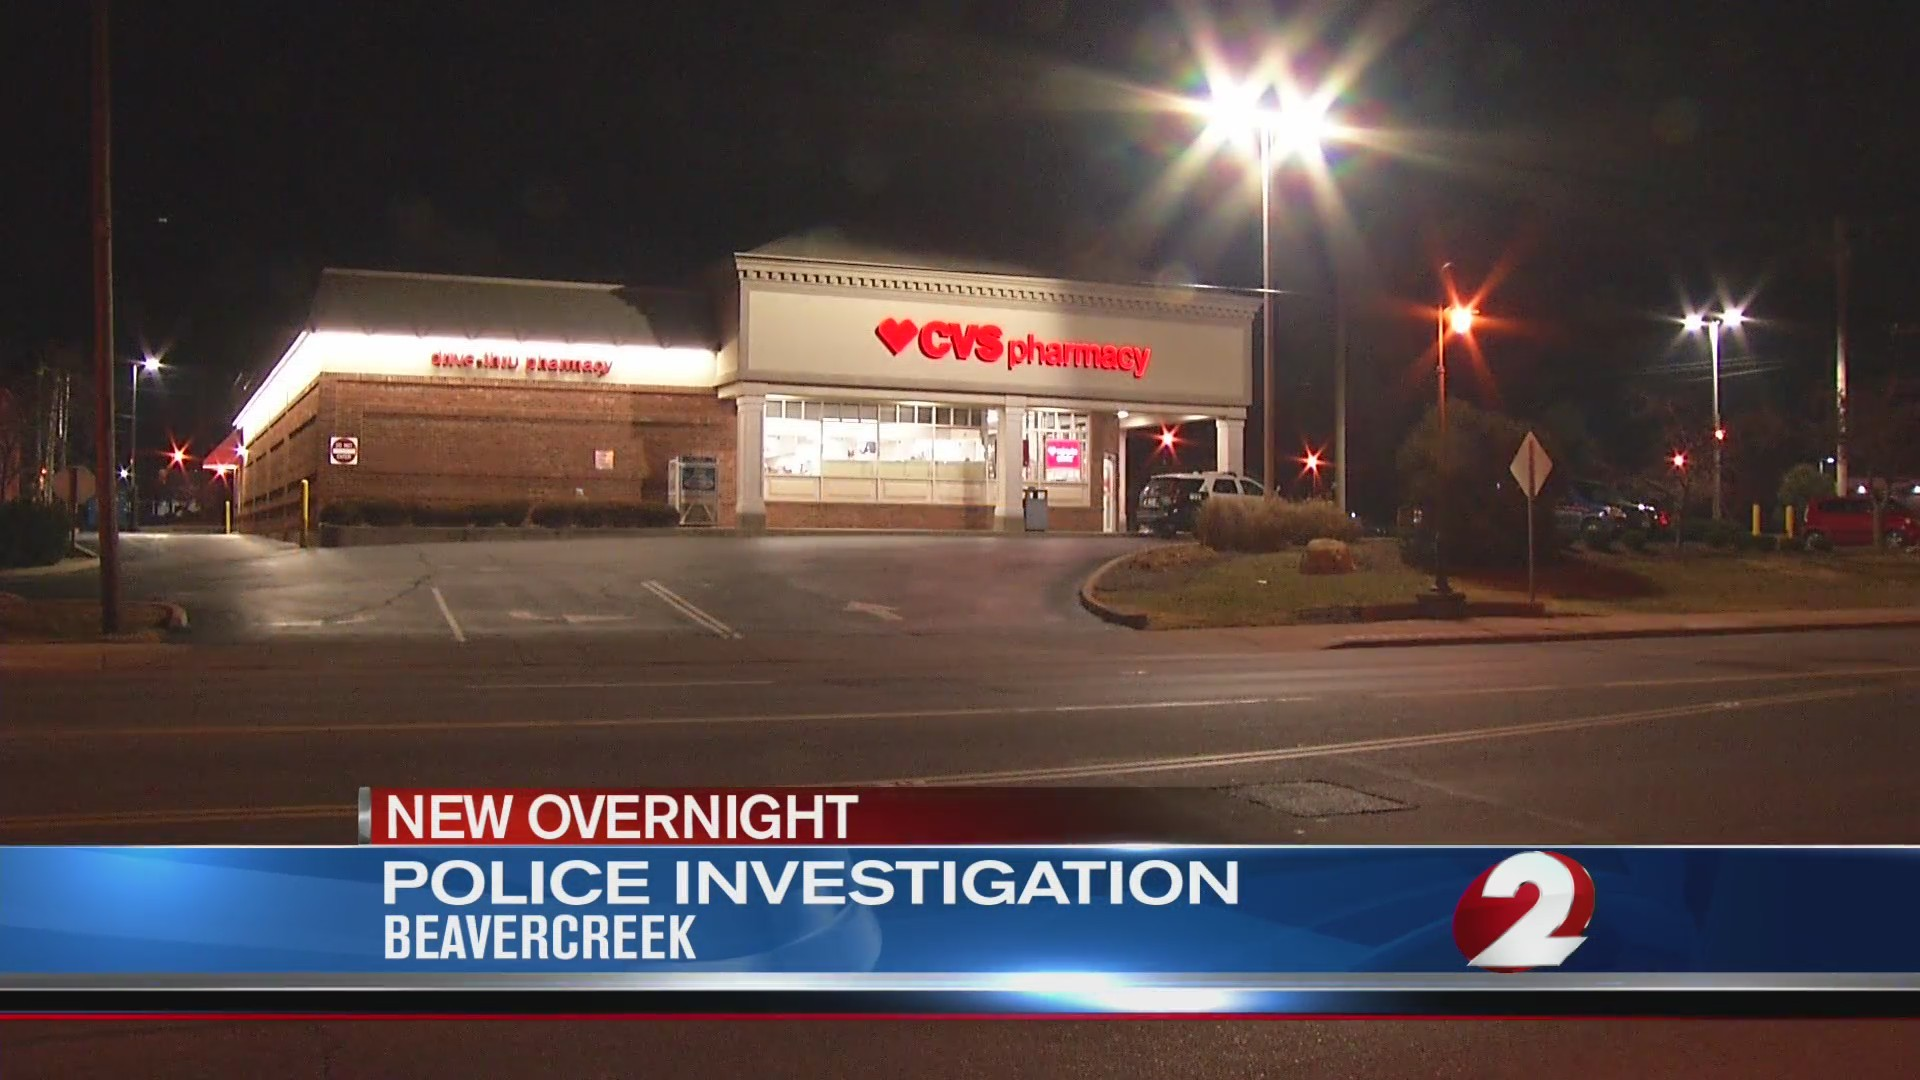 Police called to Beavercreek CVS